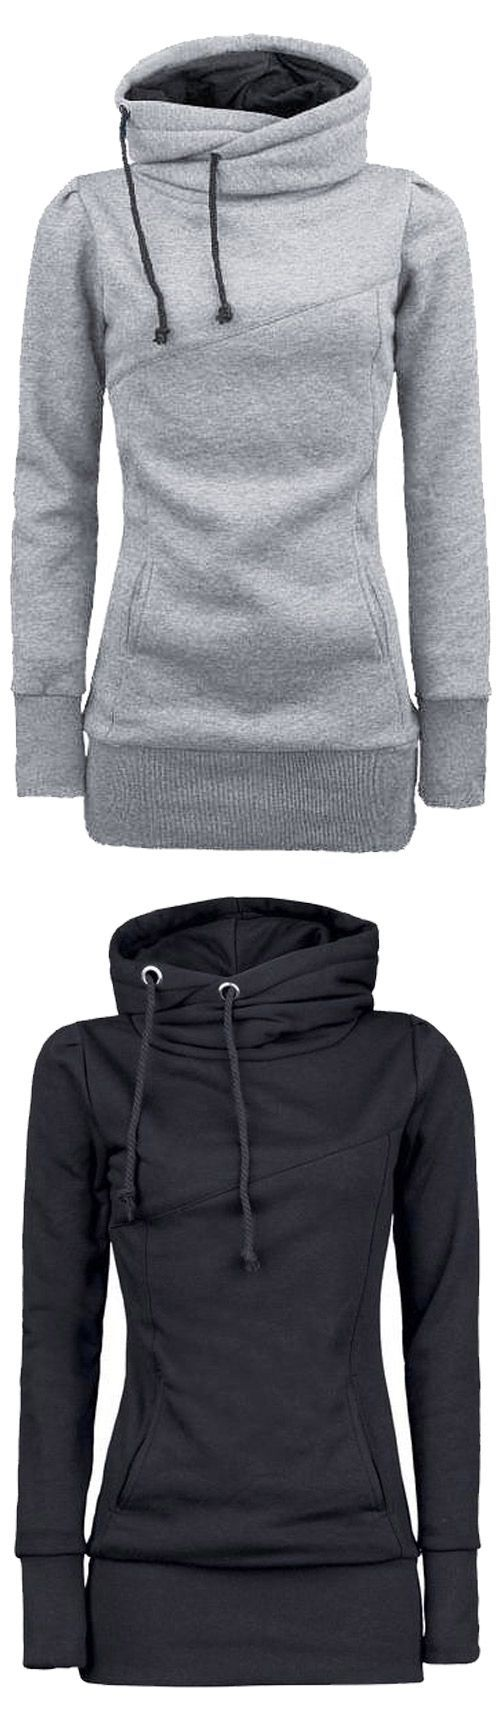 Solo Act Hooded Long Sweatshirt | Delivery, 21st and Sweatshirt